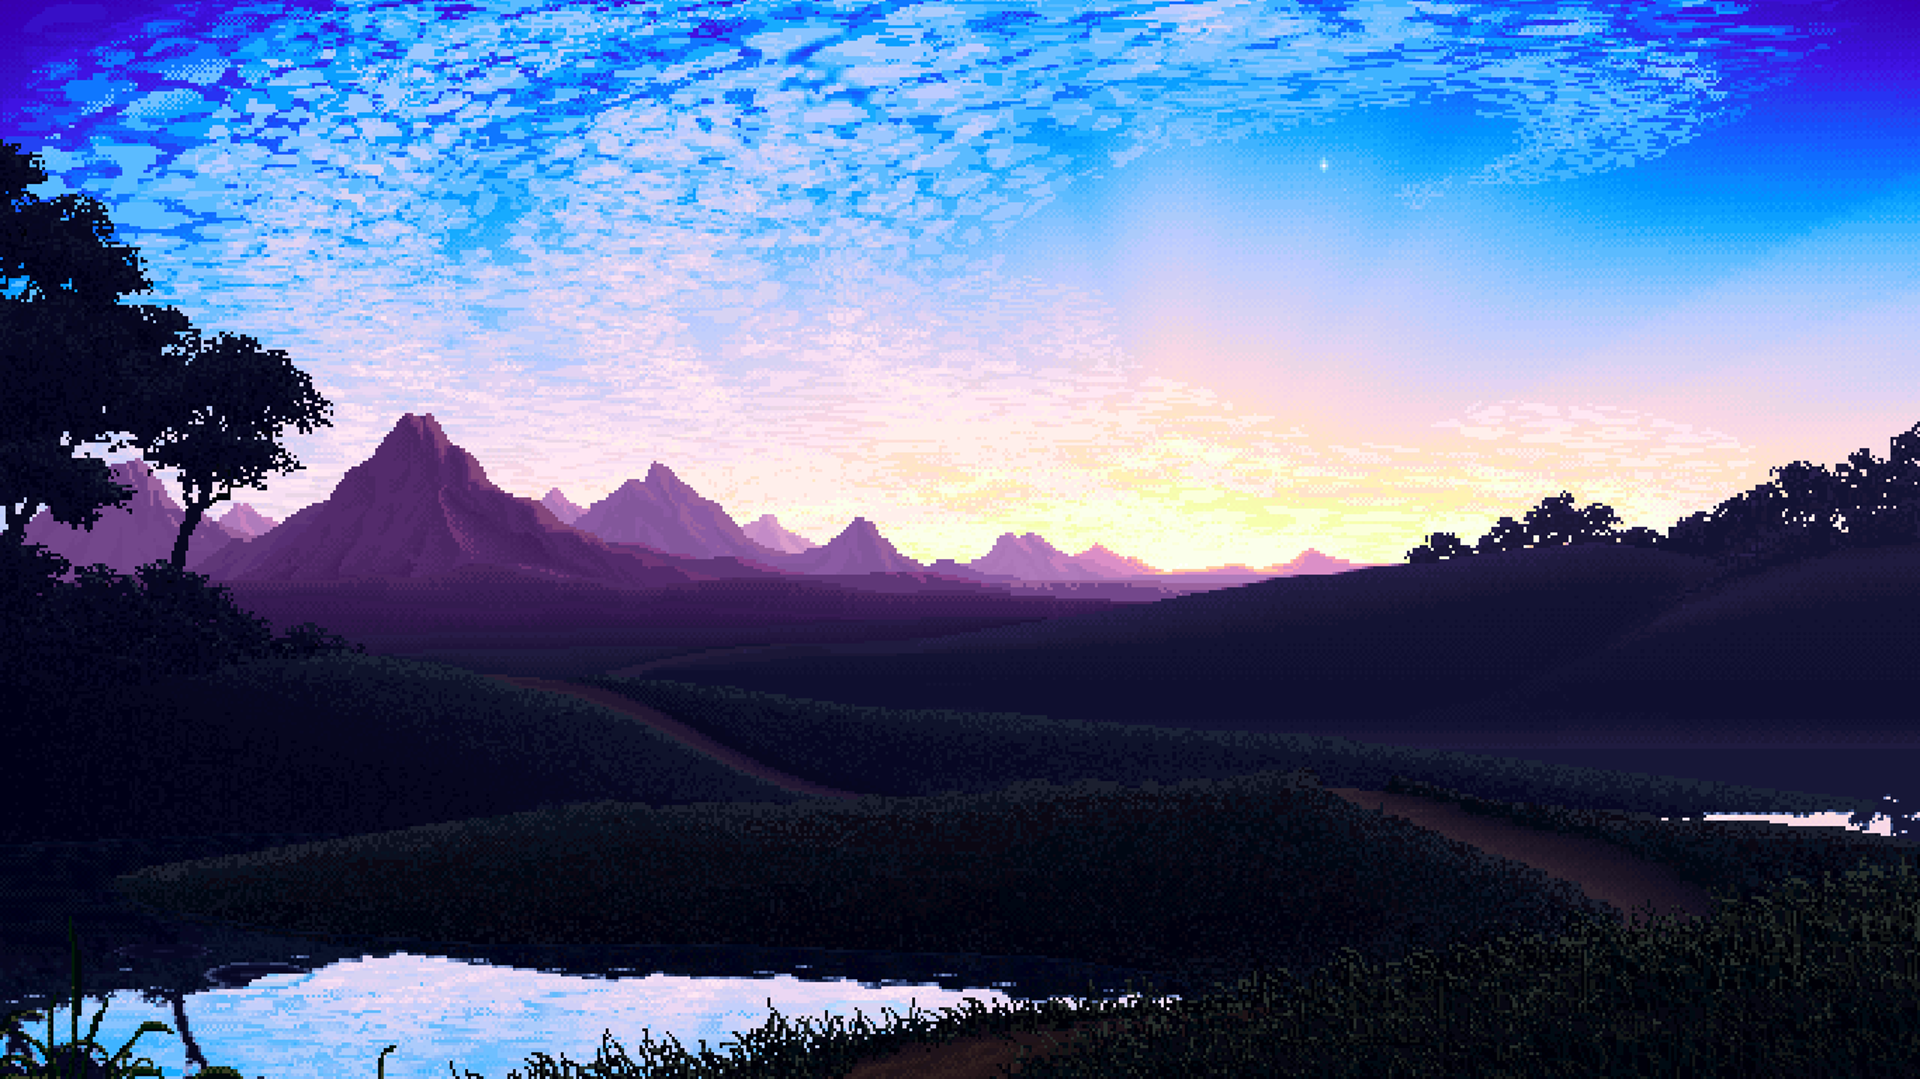 Pixel Landscape Wallpaper and Background Image | 1920x1079 ...